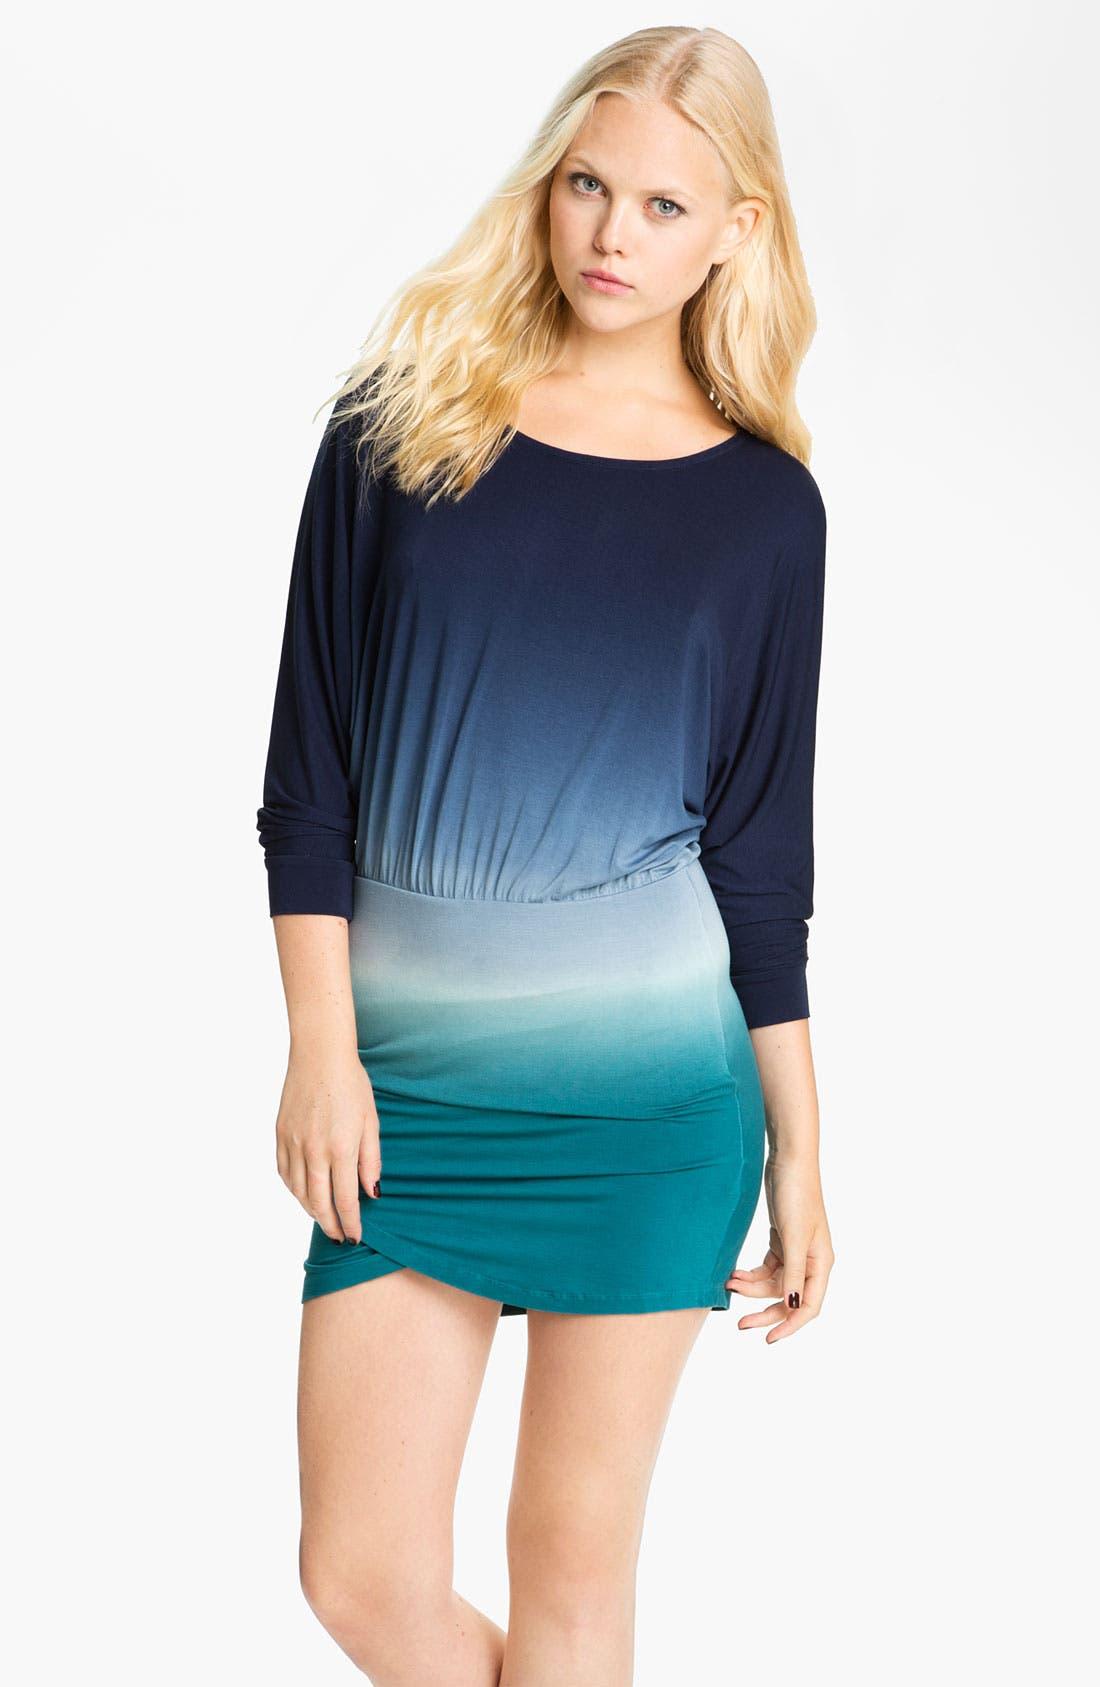 Main Image - Young, Fabulous & Broke 'Heidi' Tie Dye Dolman Dress